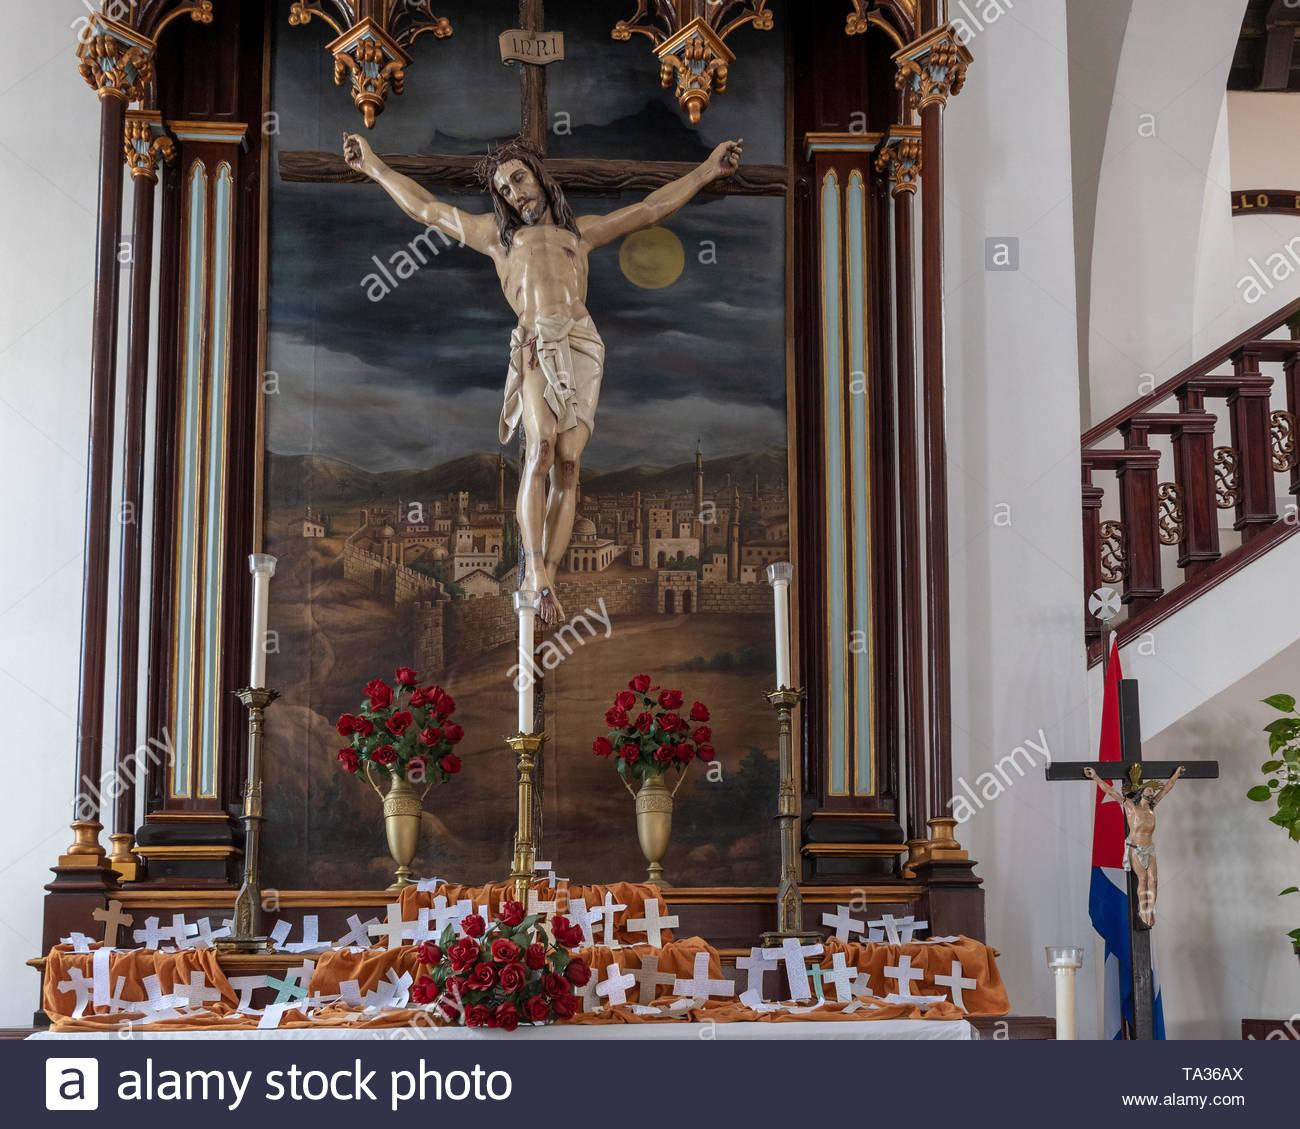 Jesus Christ in the cross  A symbol inside the Buenviaje Catholic